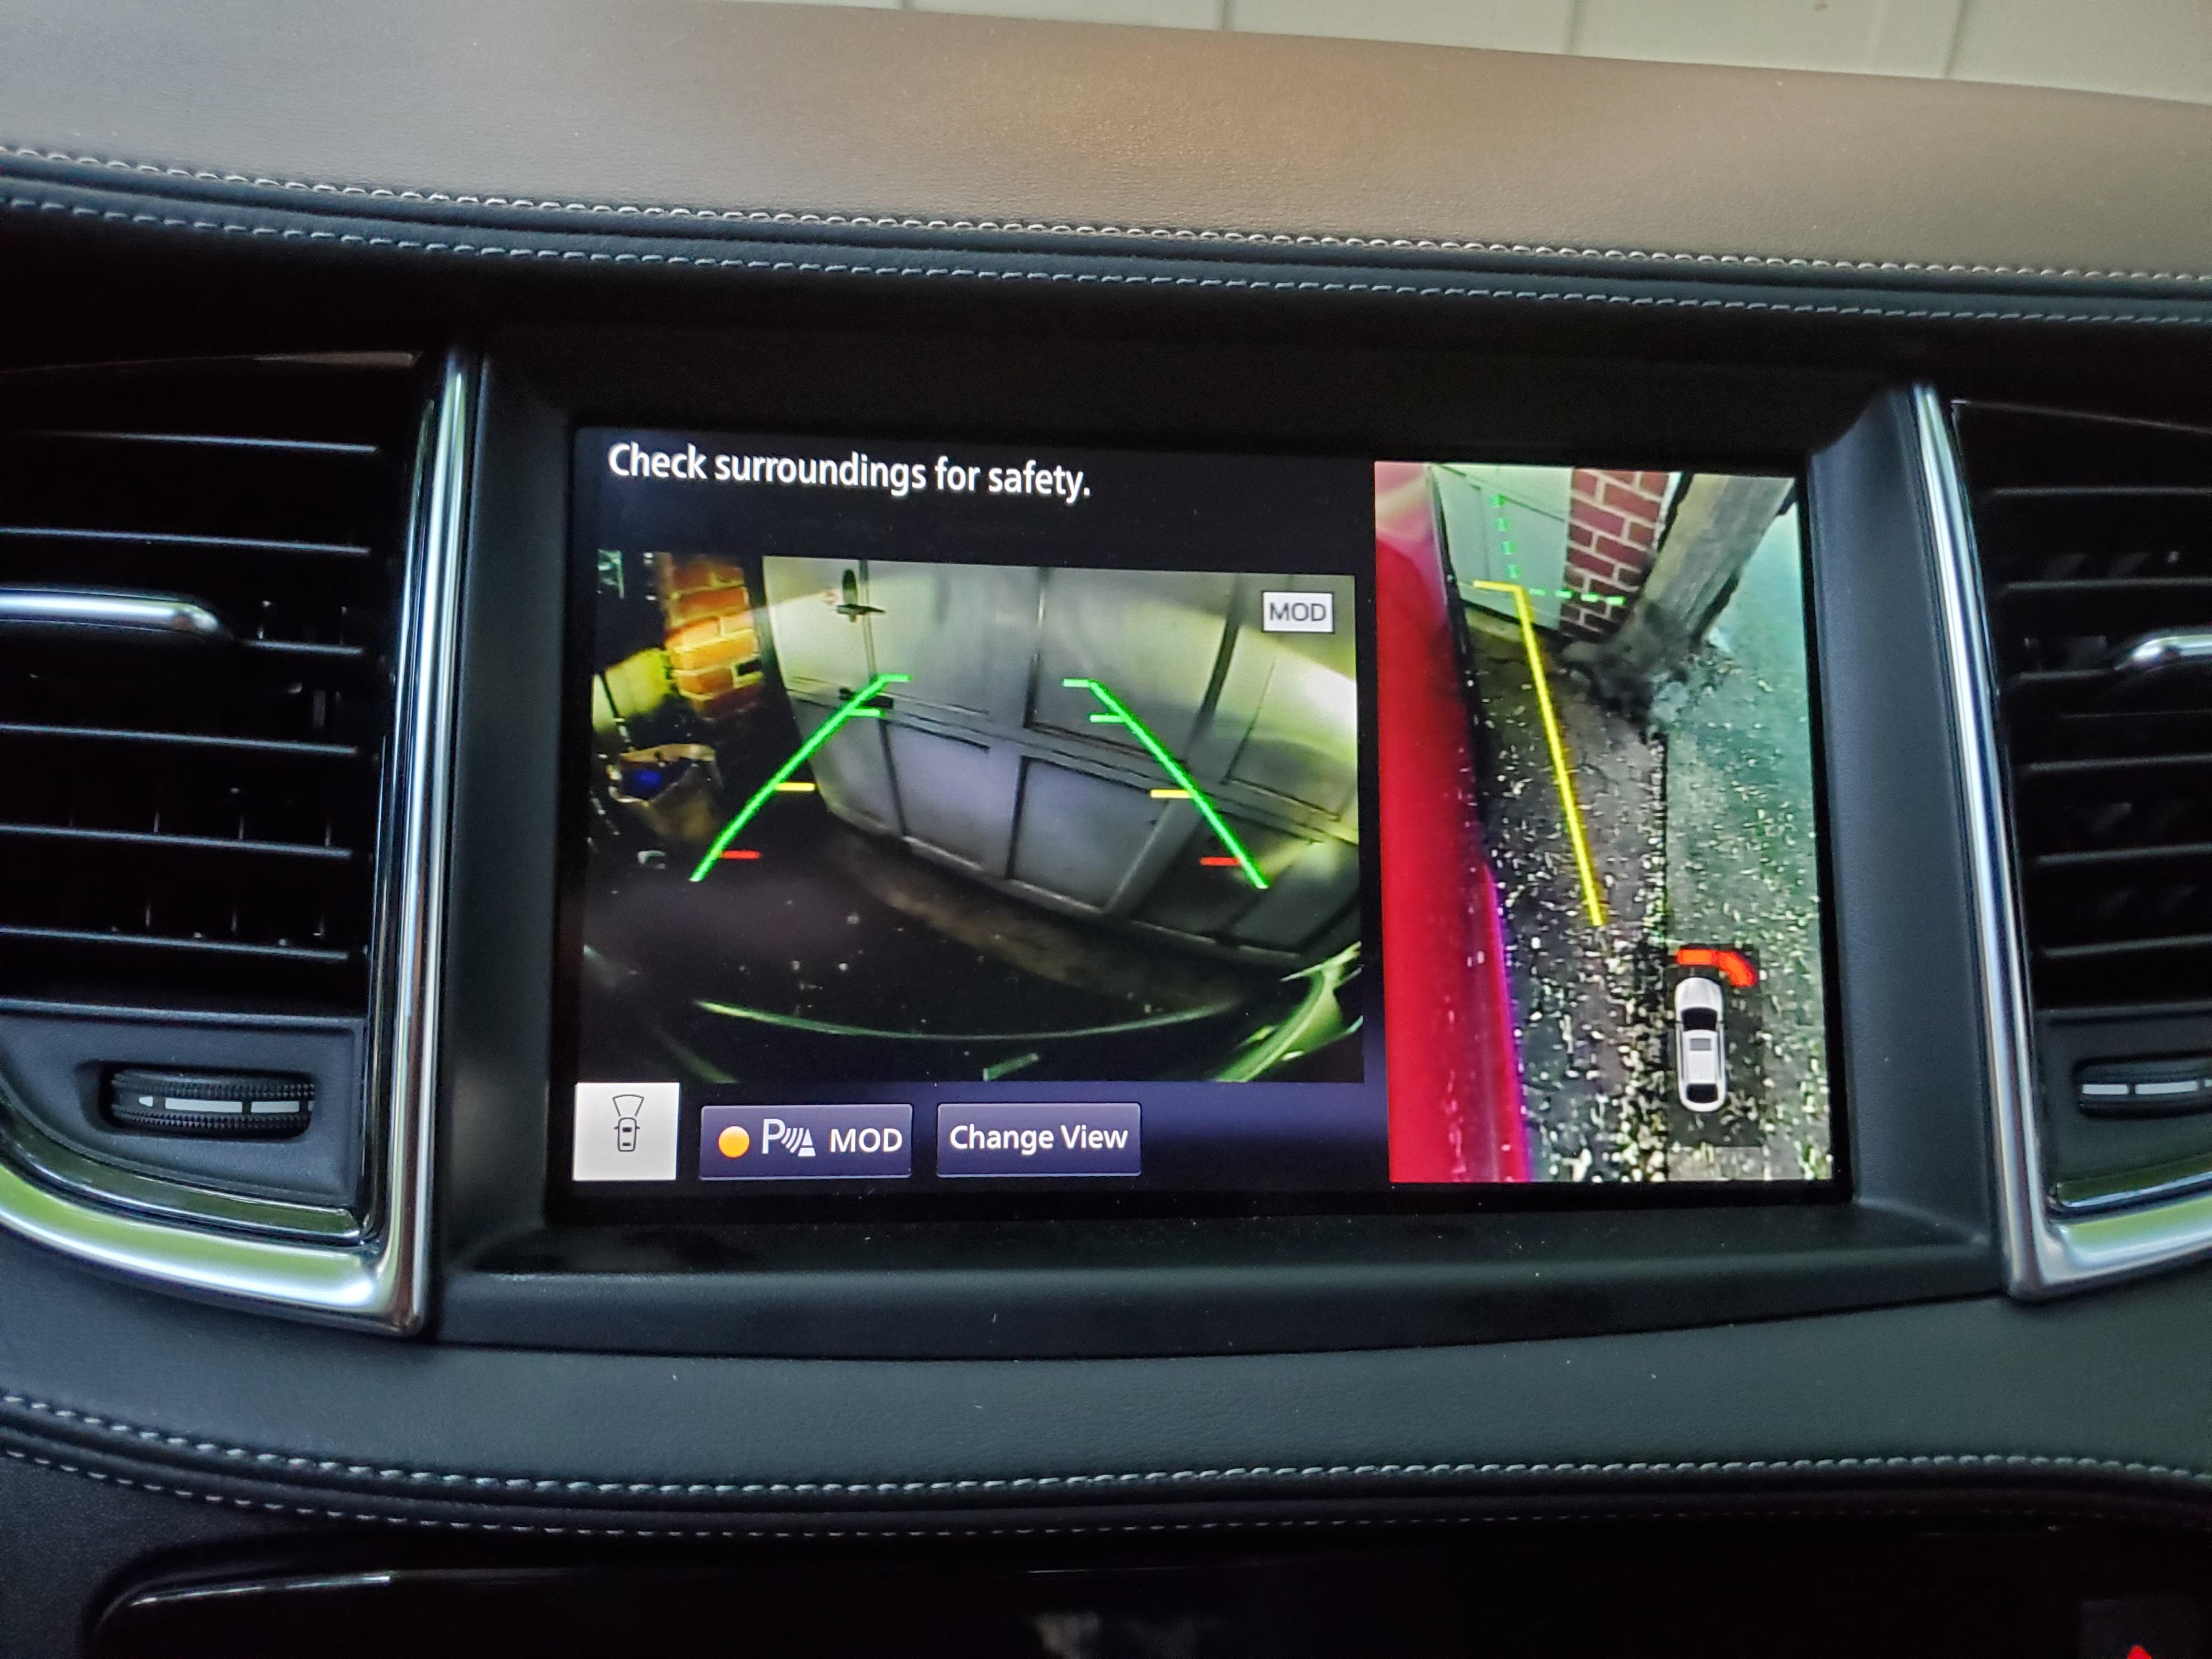 Infiniti Q55 rear view camera display